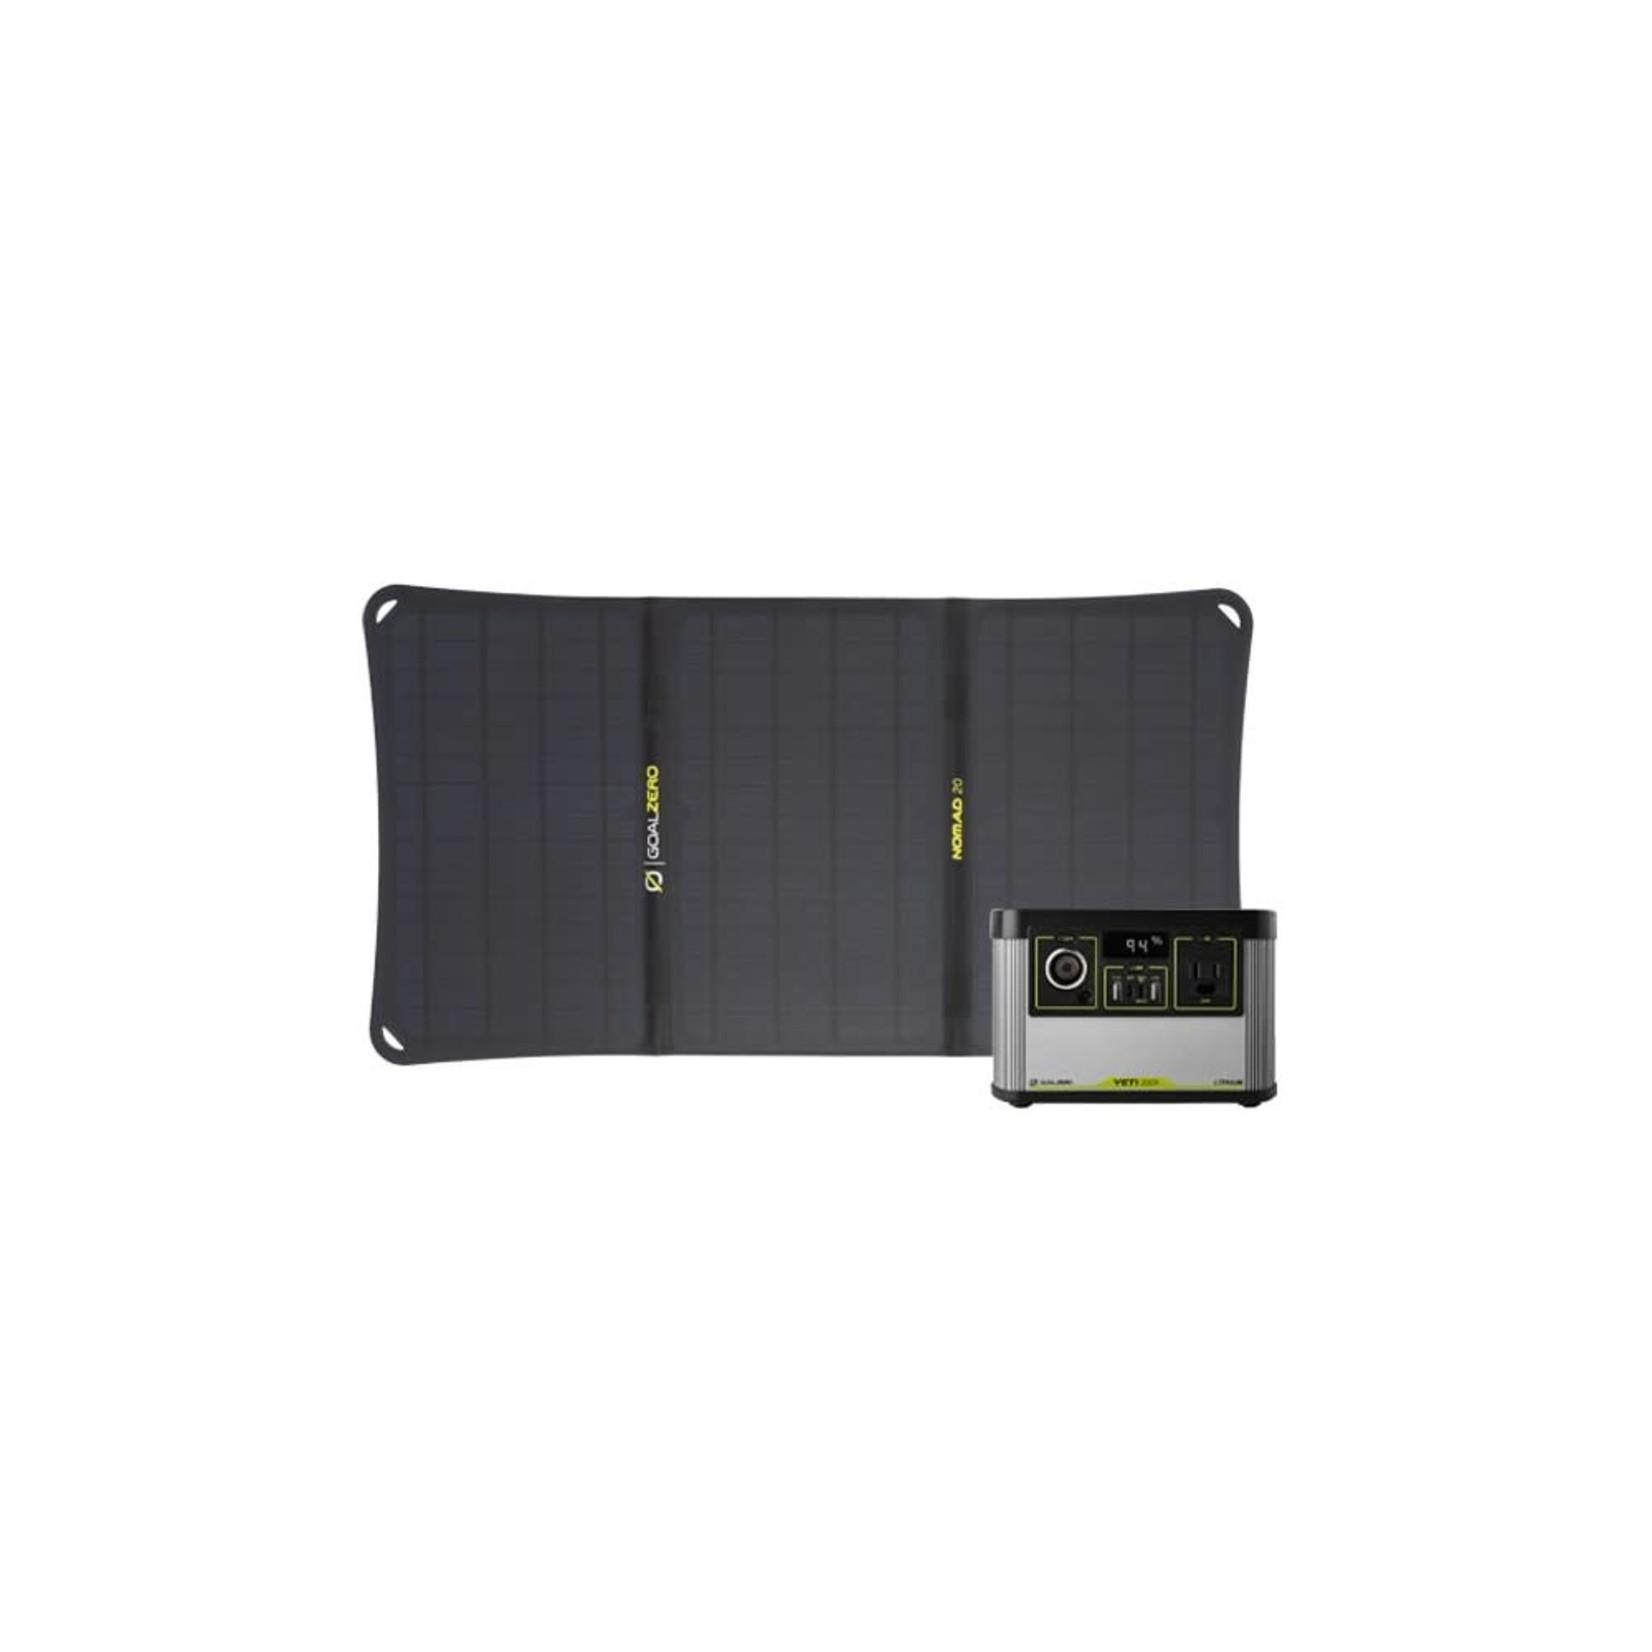 GOALZERO GOAL ZERO Yeti 200X Portable Power Station + Nomad 20 Solar Kit